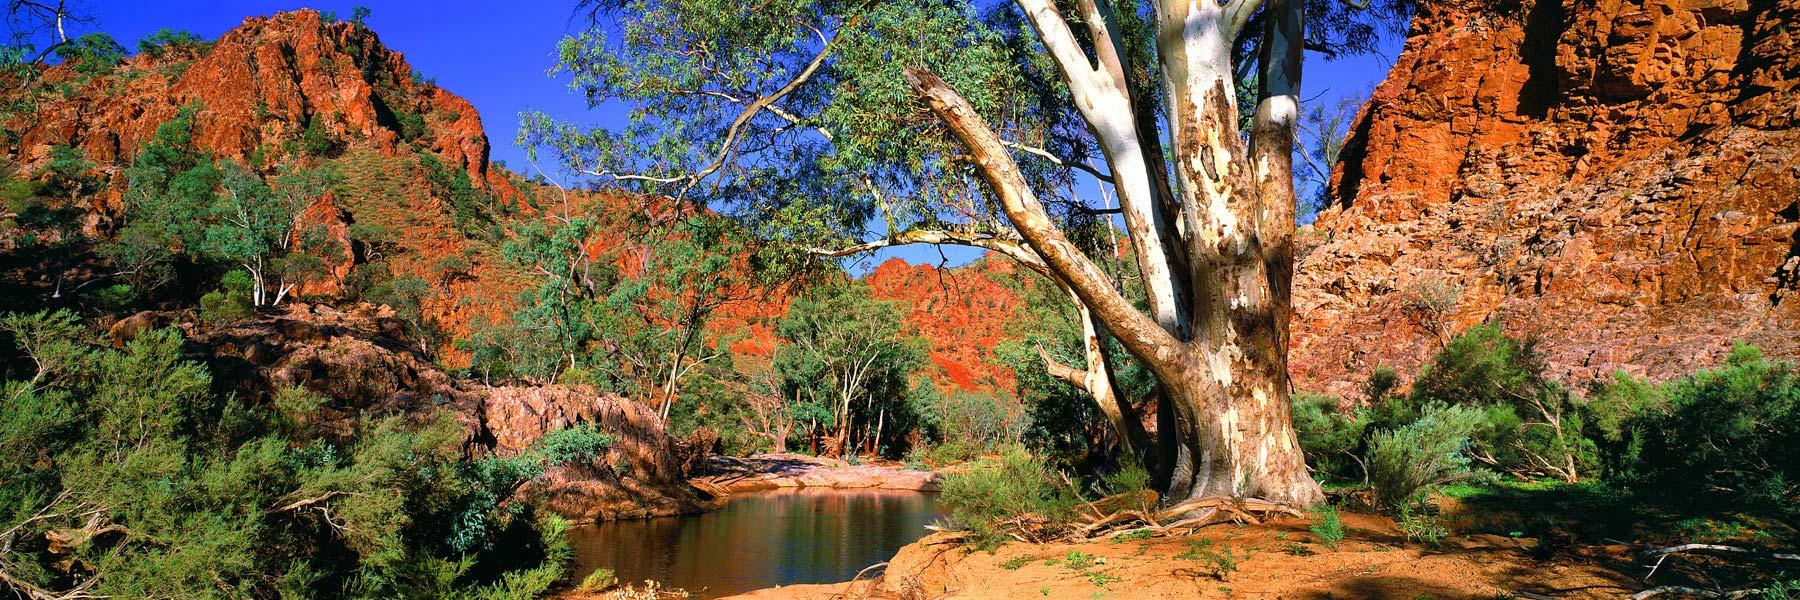 A beautiful day at Echo Camp Waterhole, Flinders Ranges, SA, Australia.